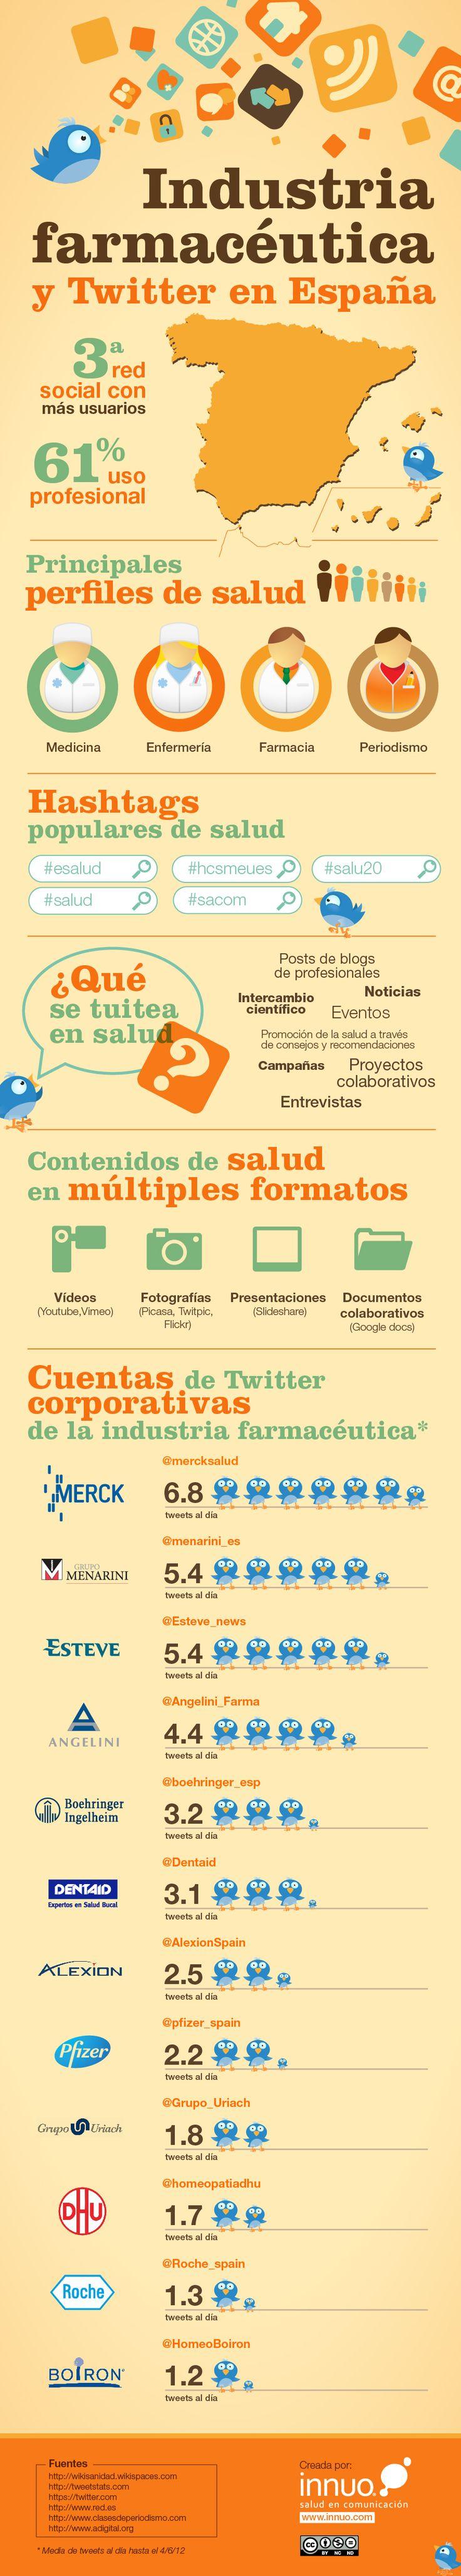 Industria farmaceutica y Twitter en España  http://nuevastecsomamfyc.files.wordpress.com/2012/09/infografia_twitter_farma_es2.jpg